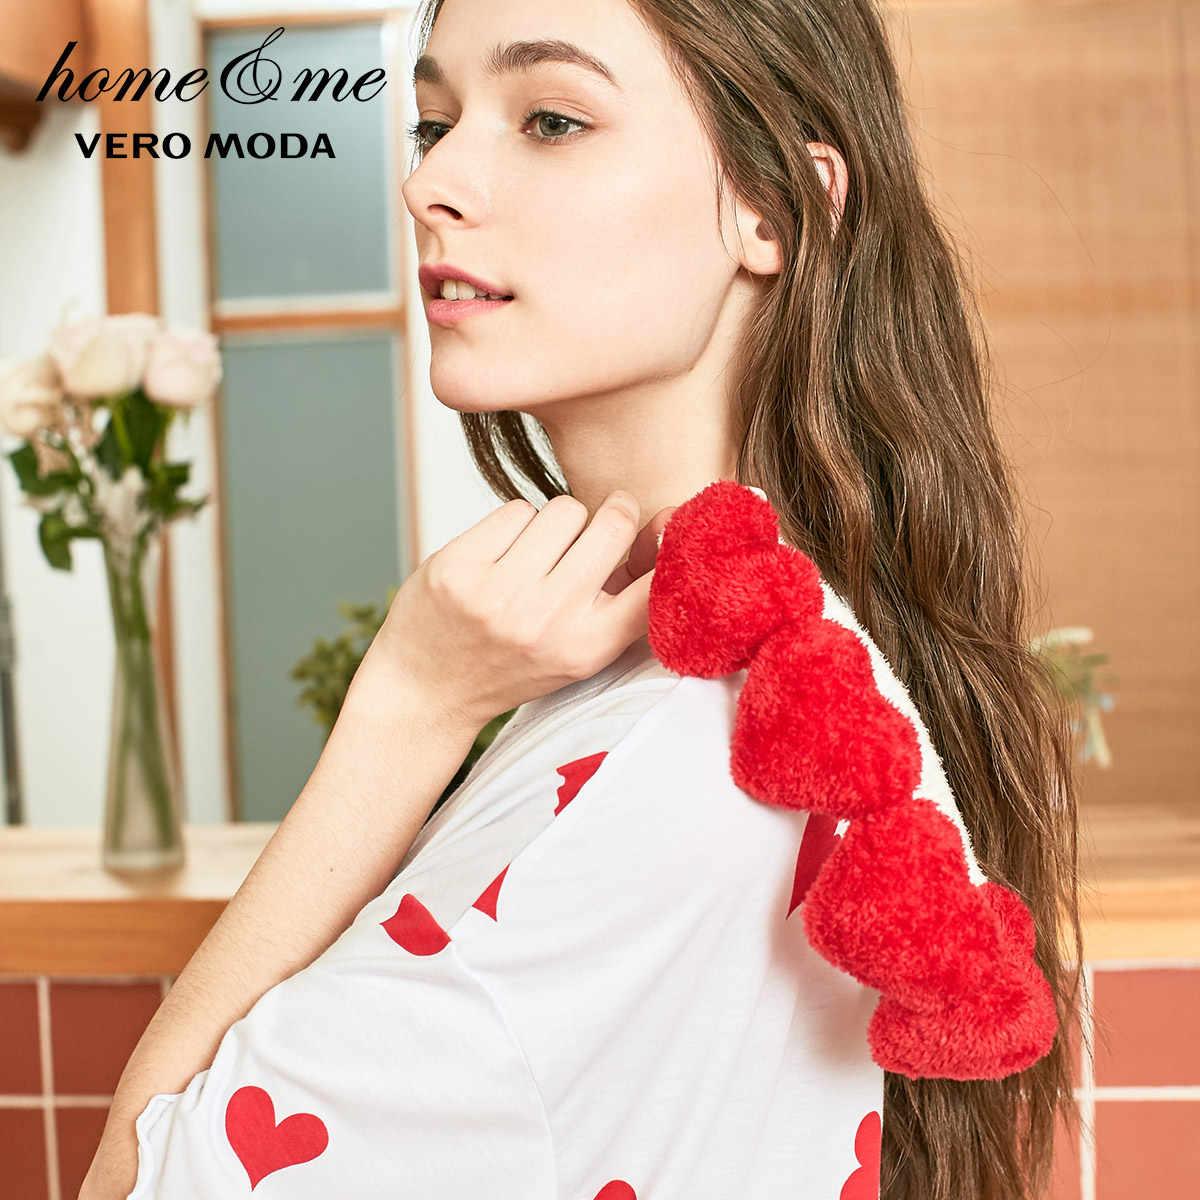 Vero Moda Nieuwe Vrouwen Hartvormige Print Haarband Loose Fit T-shirt Homewear Jurk | 319161527